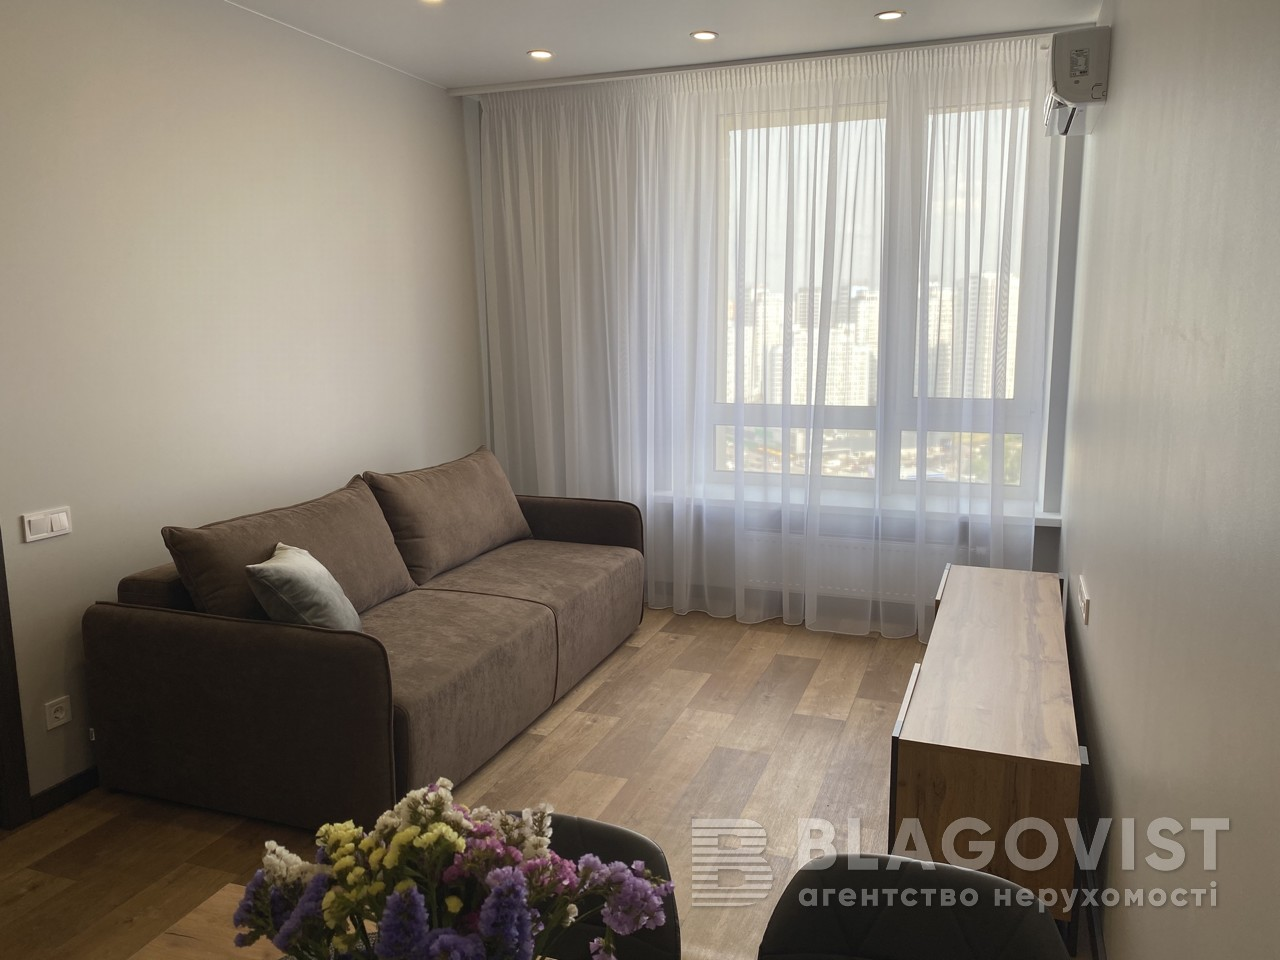 Квартира R-39866, Заречная, 2 корпус 2, Киев - Фото 1